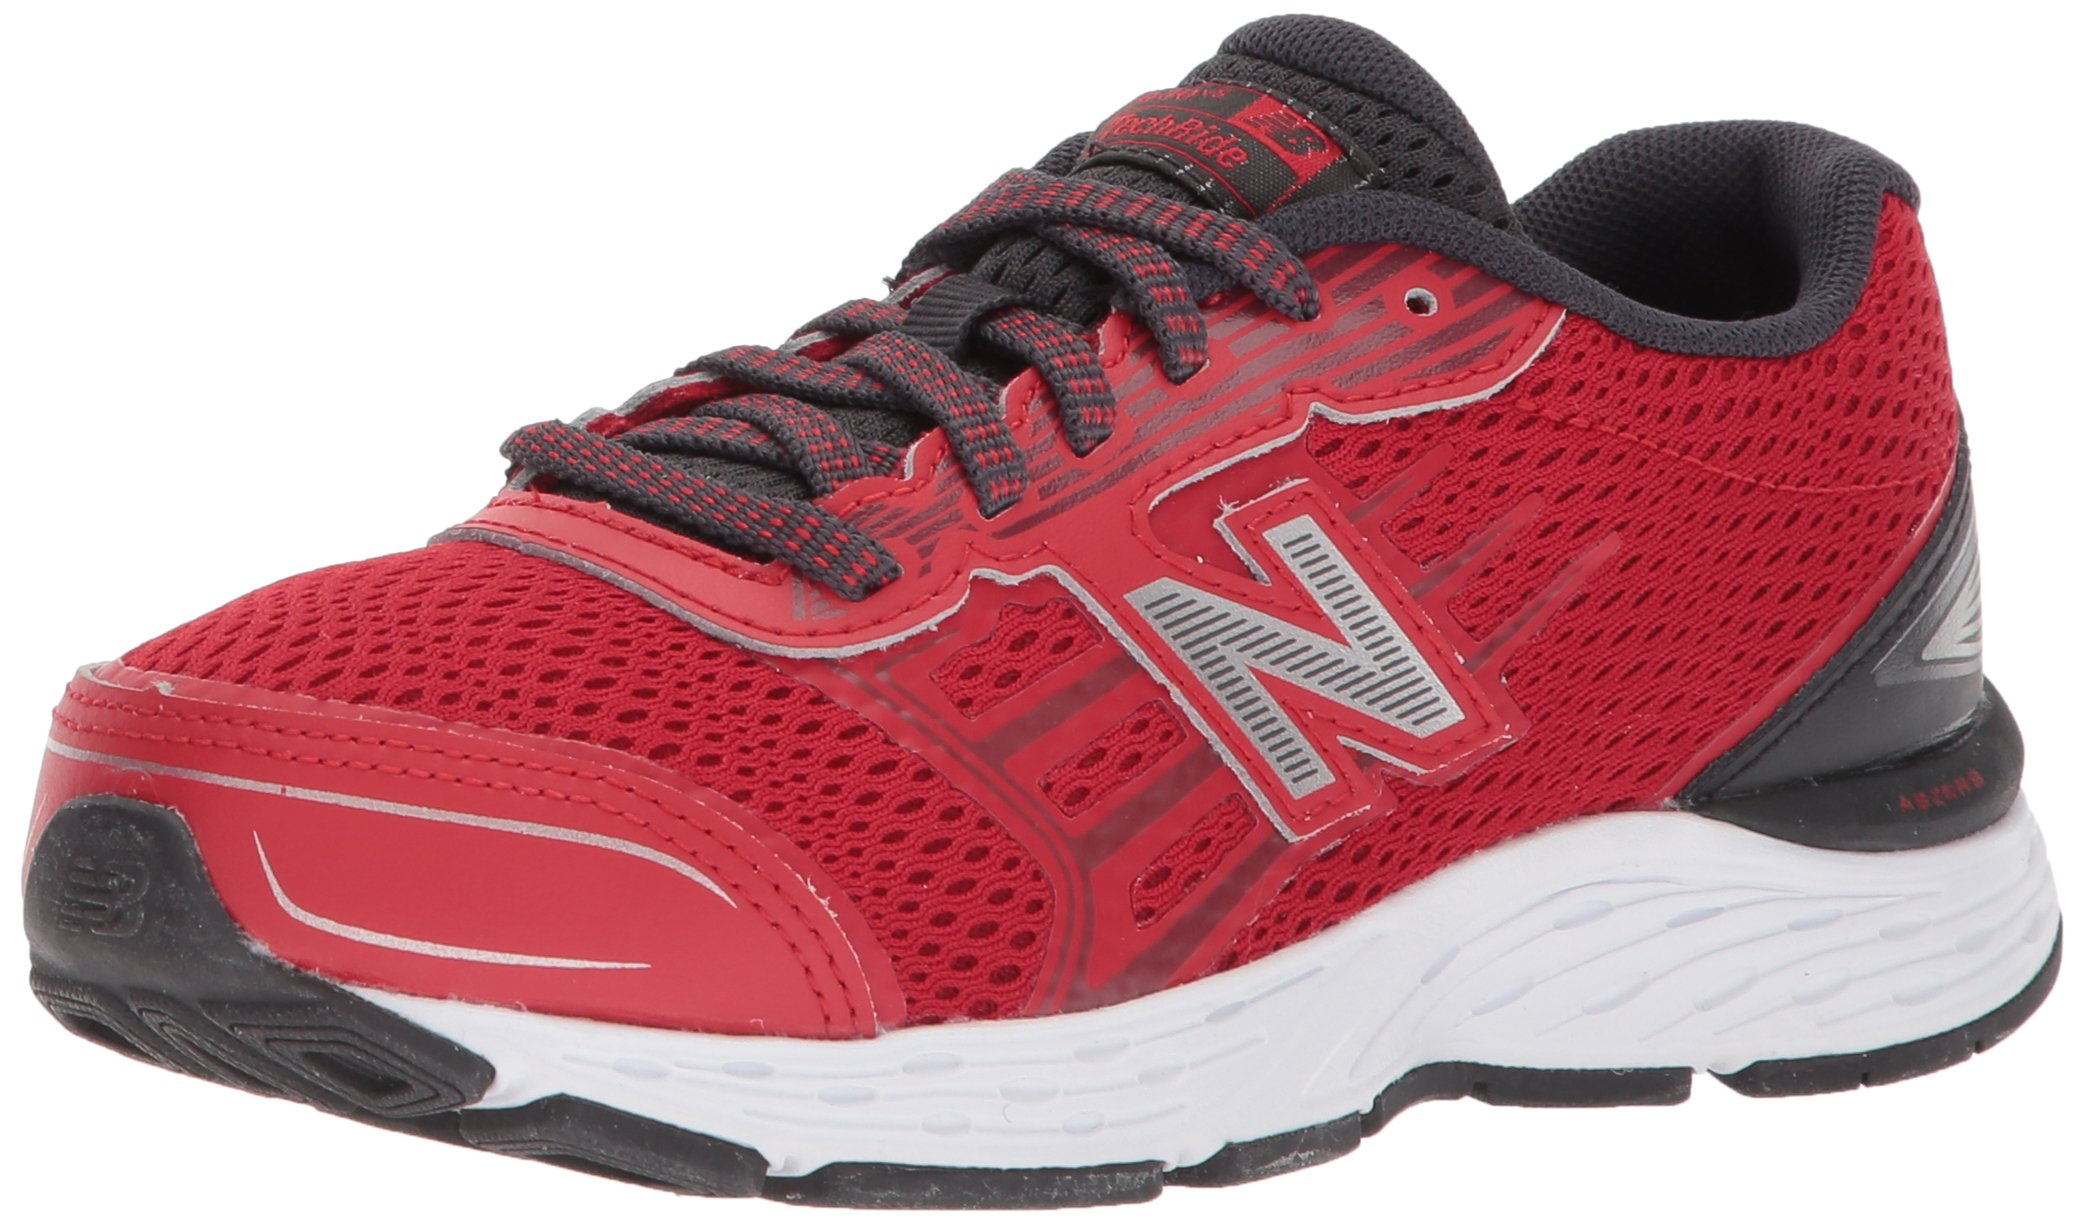 New Balance Boys' 680v5 Running Shoe, Team Red/Phantom, 4 M US Big Kid